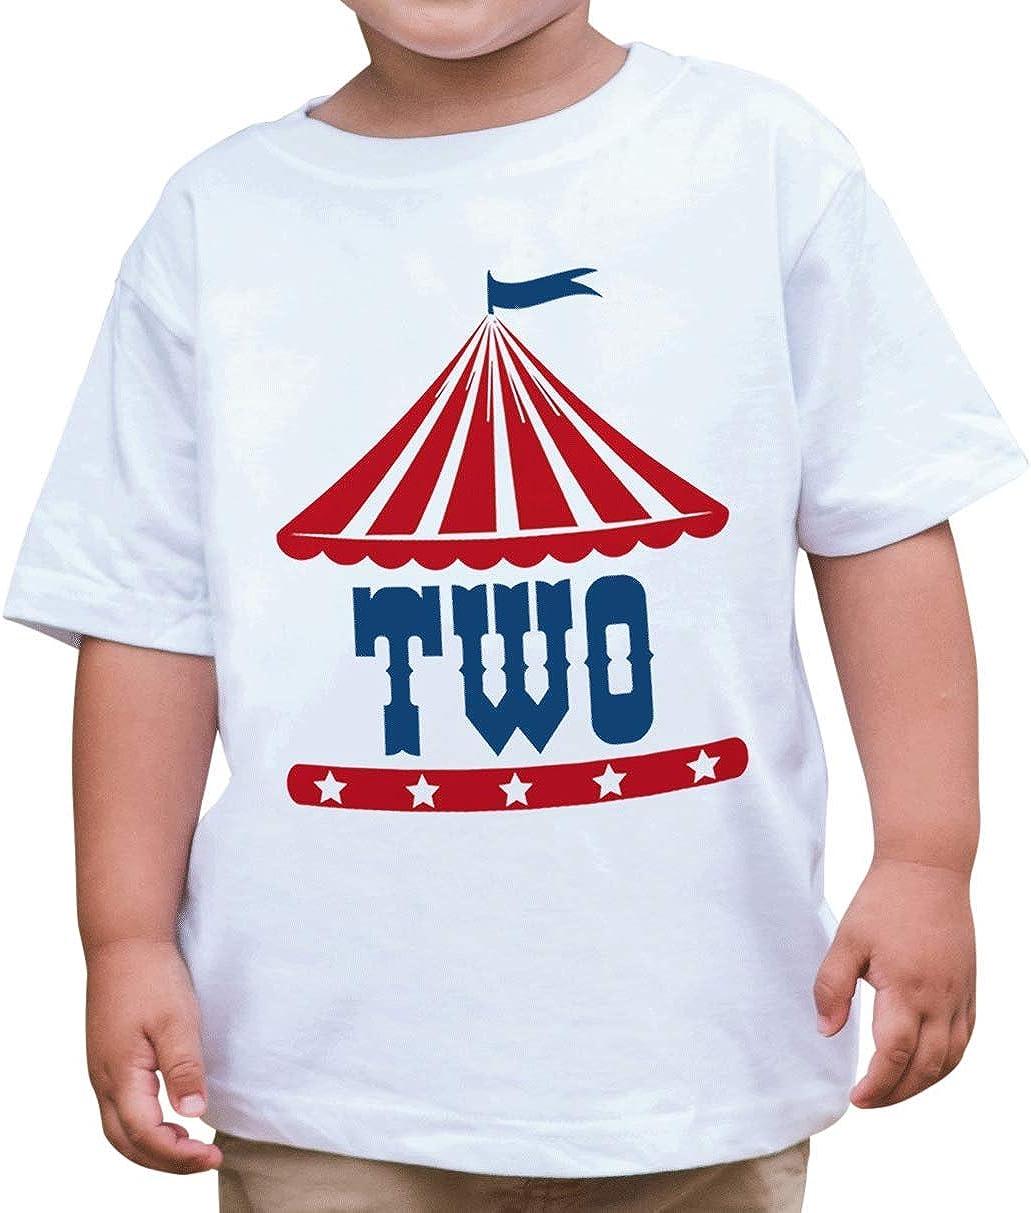 7 ate 9 Apparel Boys Birthday Two Circus T-Shirt